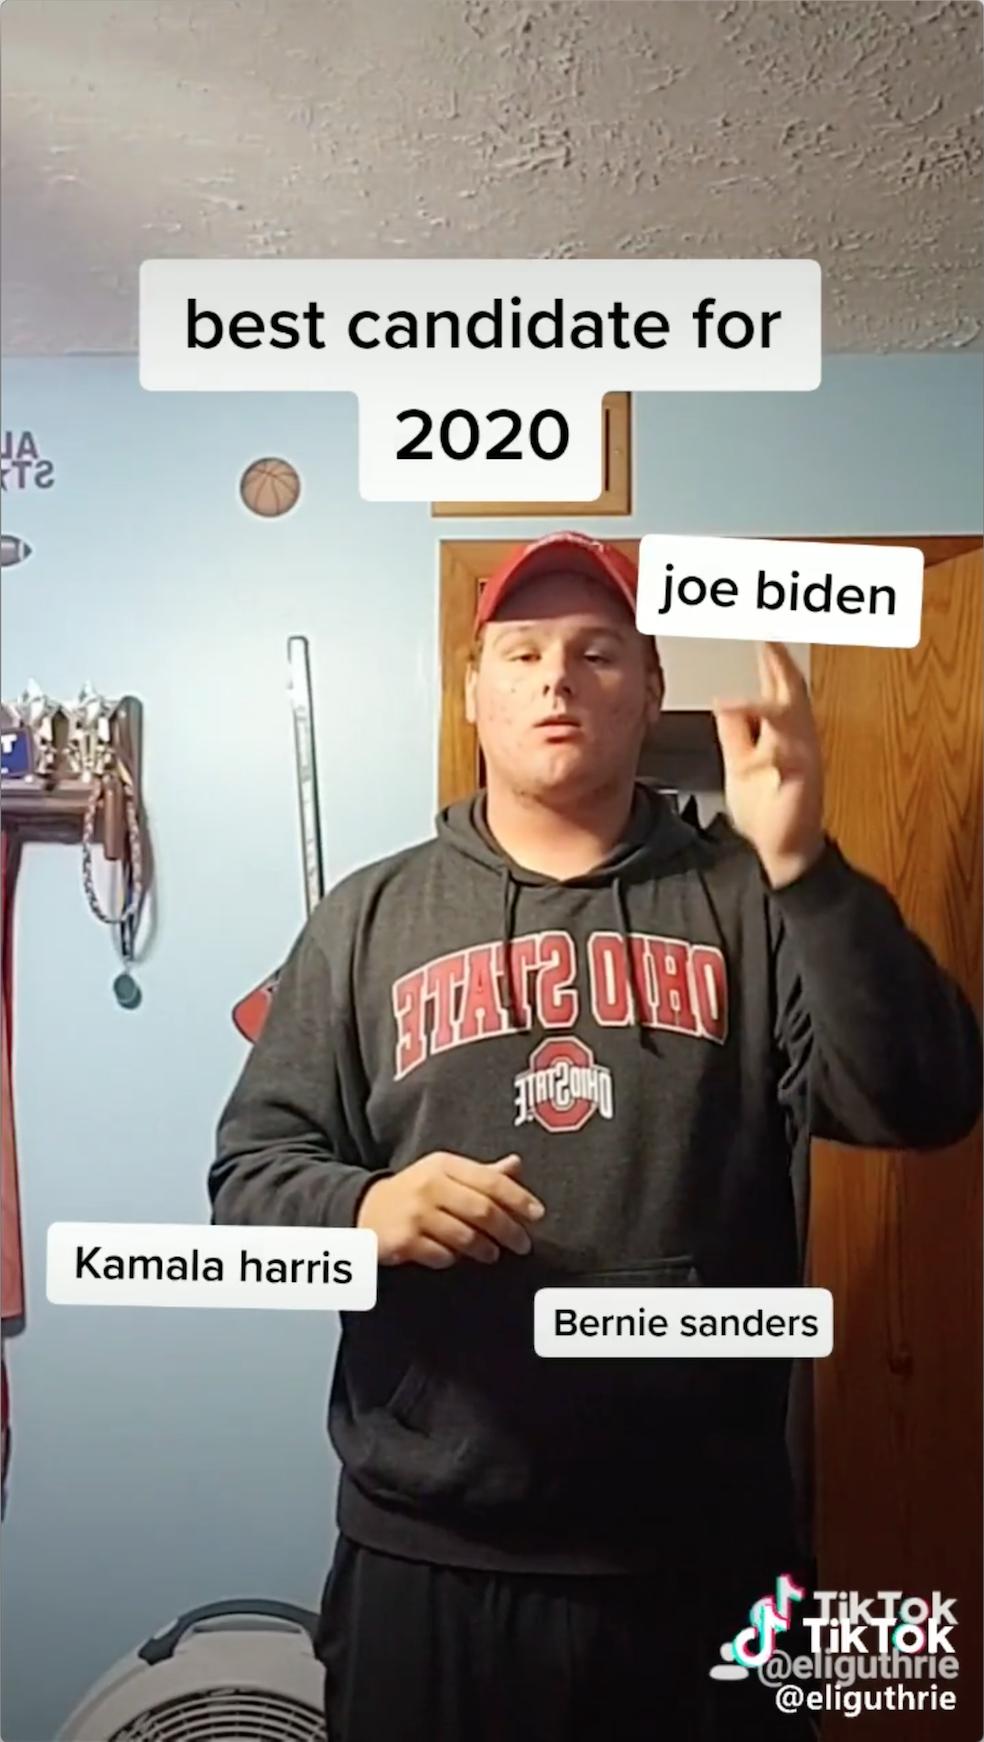 Pro Trump Videos Are Thriving On Tiktok Quartz